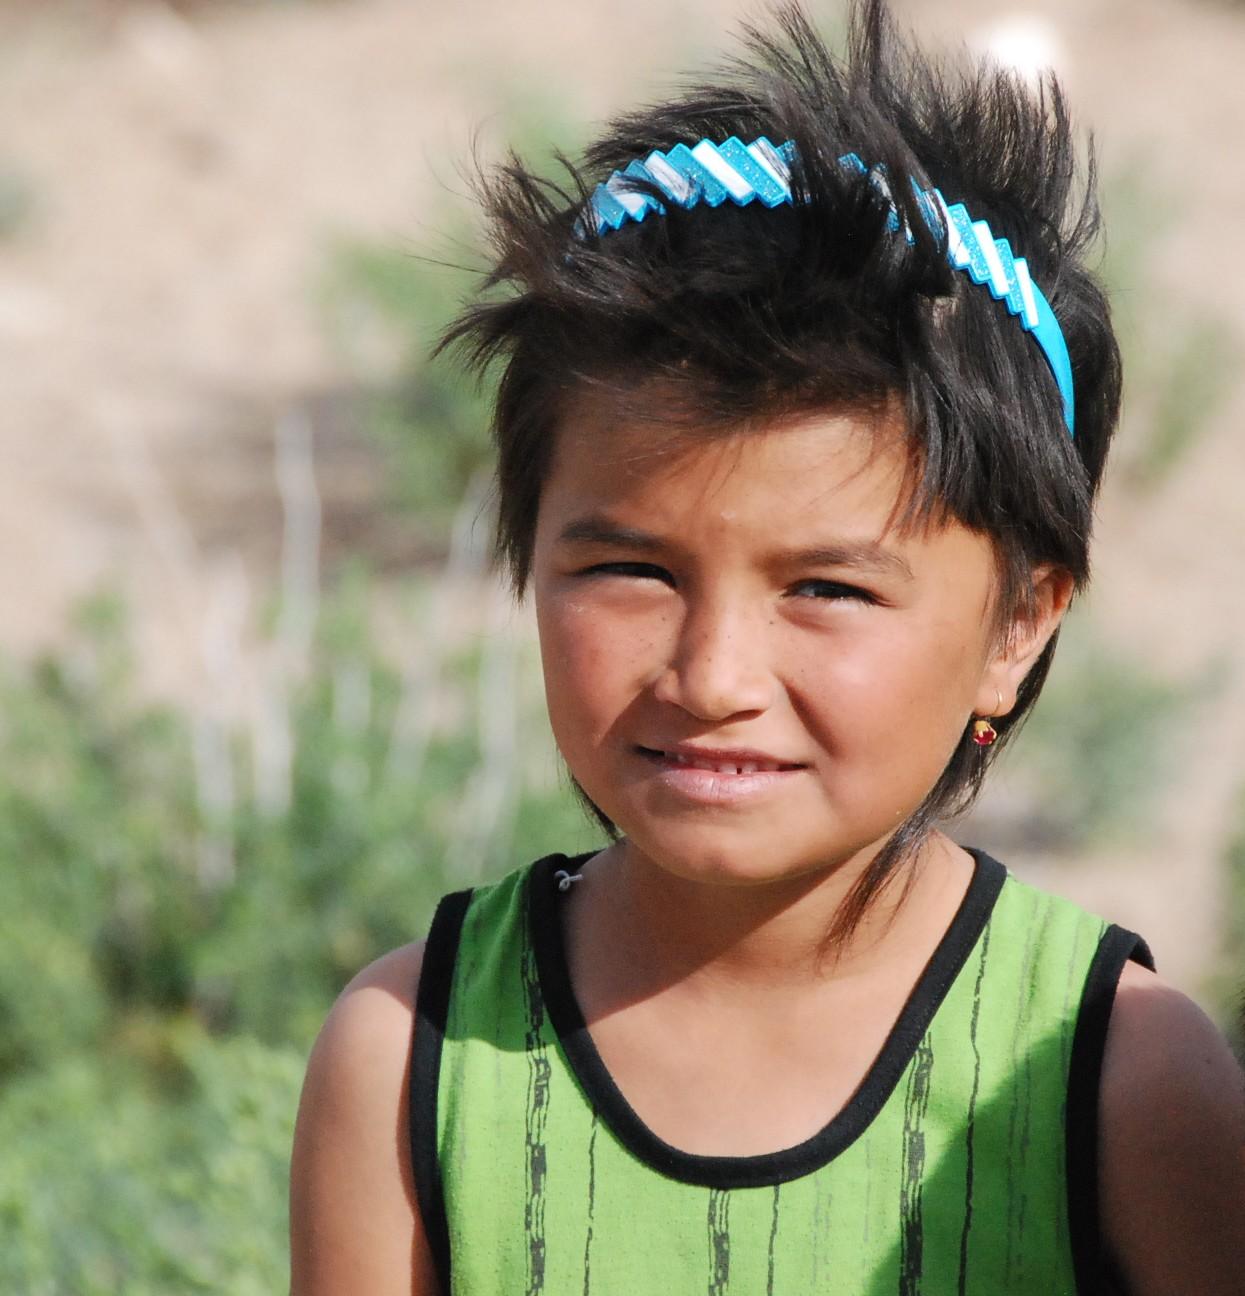 Ouzbekistan 409